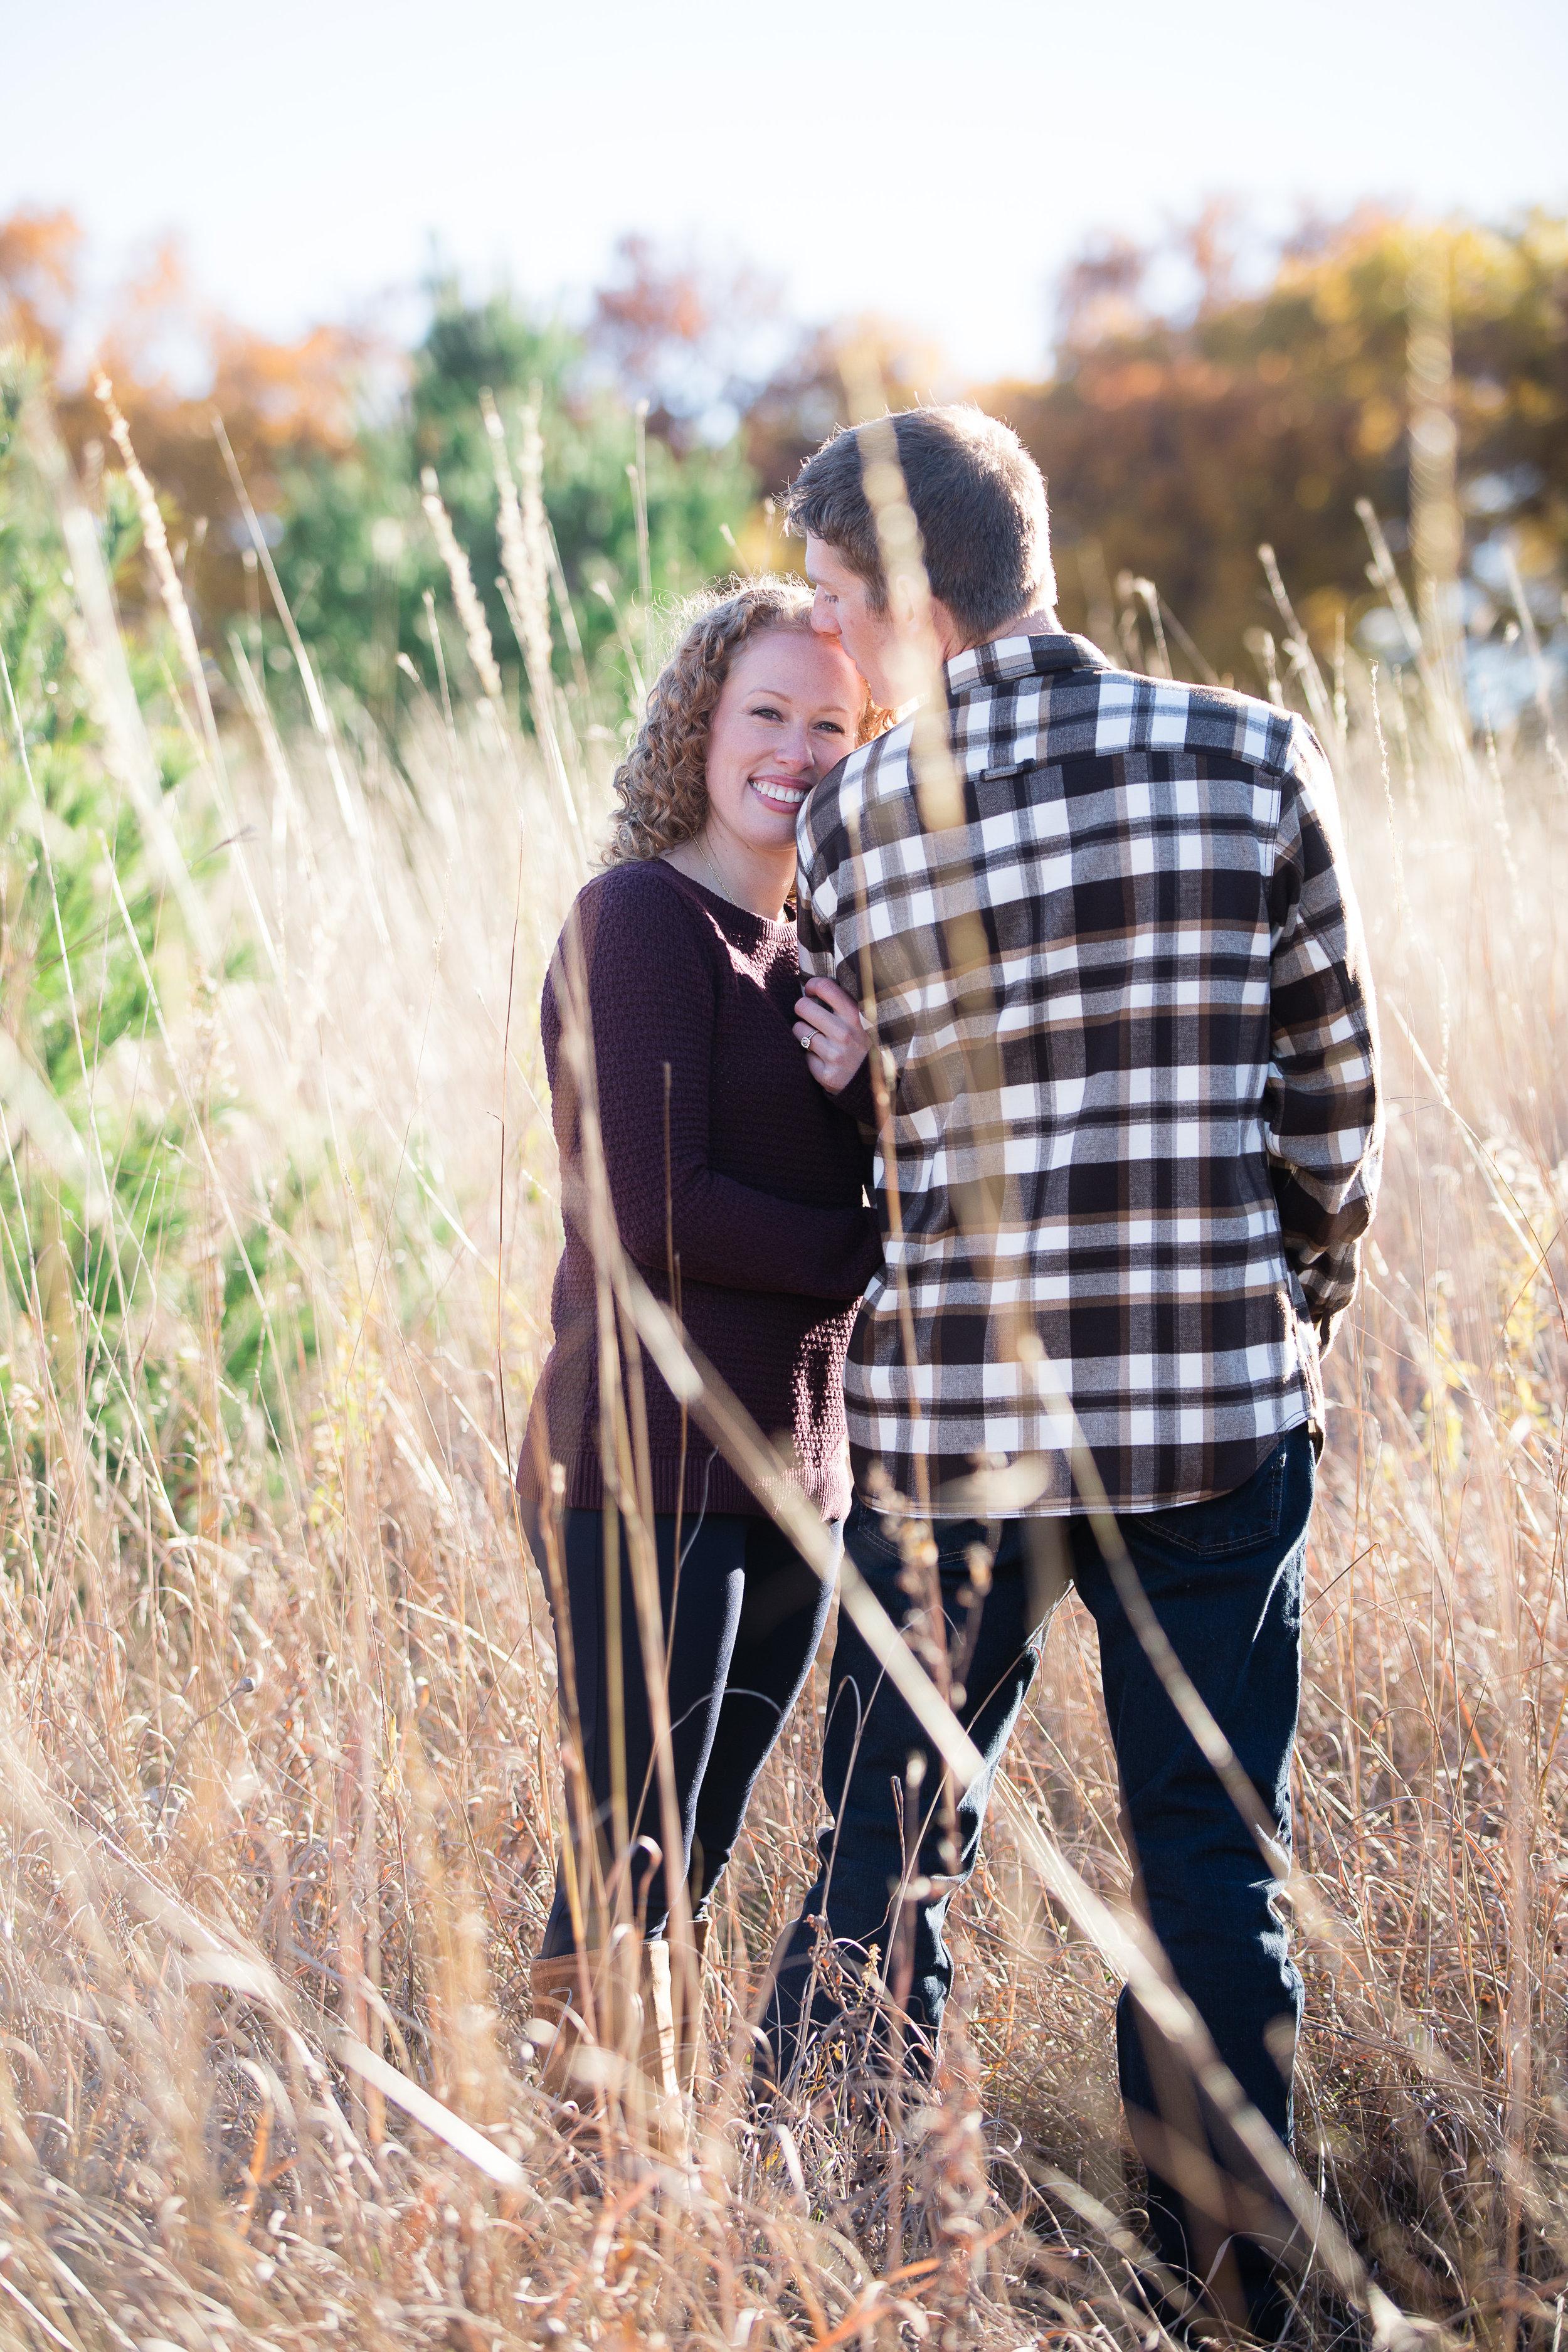 20181020_Ray&Joscelyn_Engagement-5.jpg